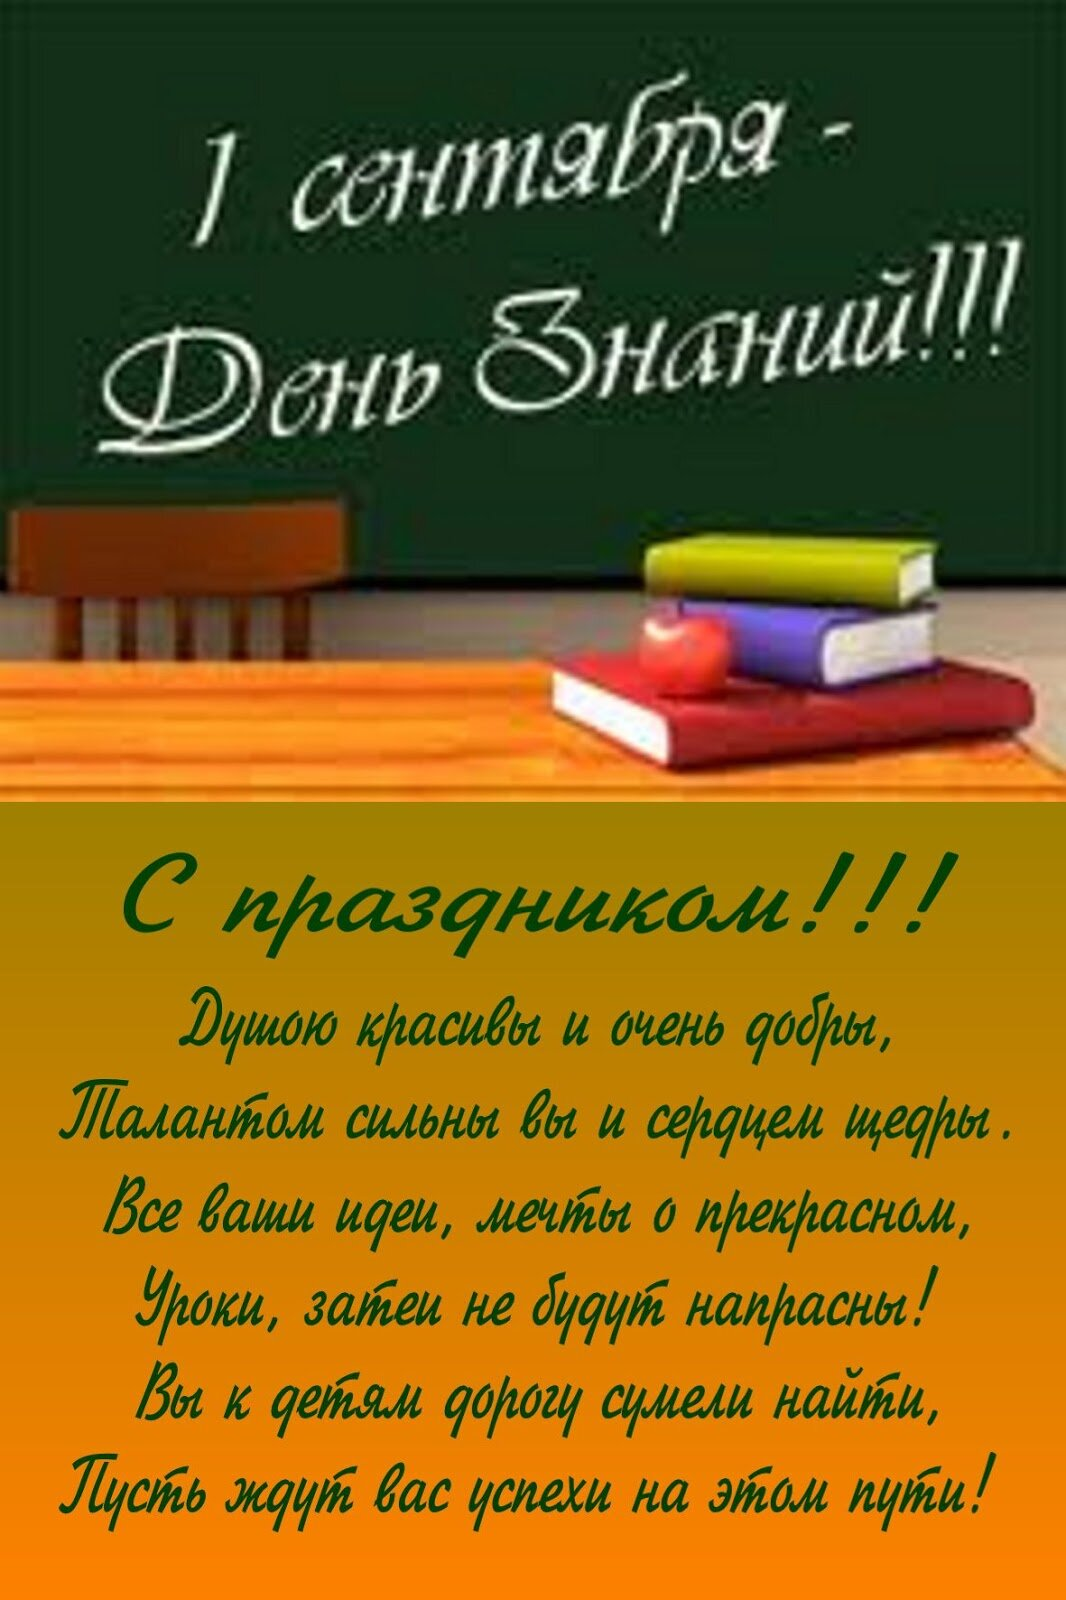 Поздравления на 1 сентября преподавателям